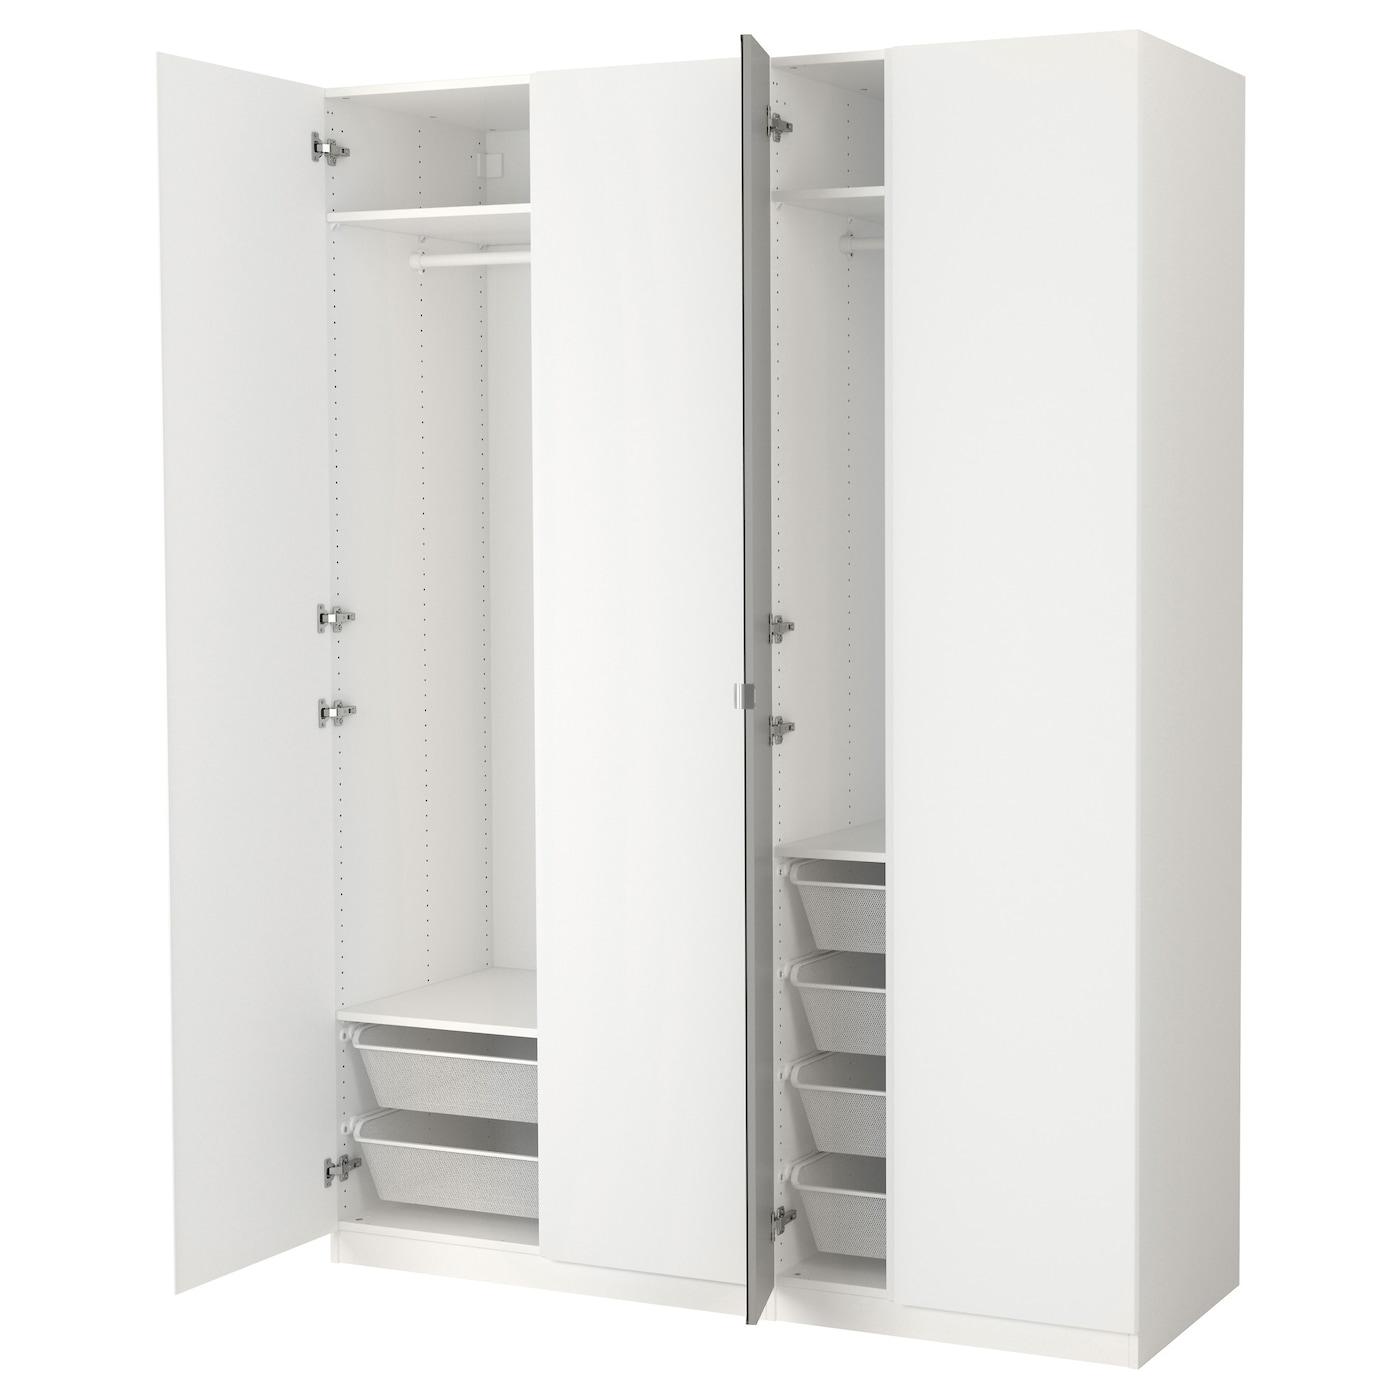 pax armoire penderie blanc vikanes vikedal 175 x 60 x 236 cm ikea. Black Bedroom Furniture Sets. Home Design Ideas